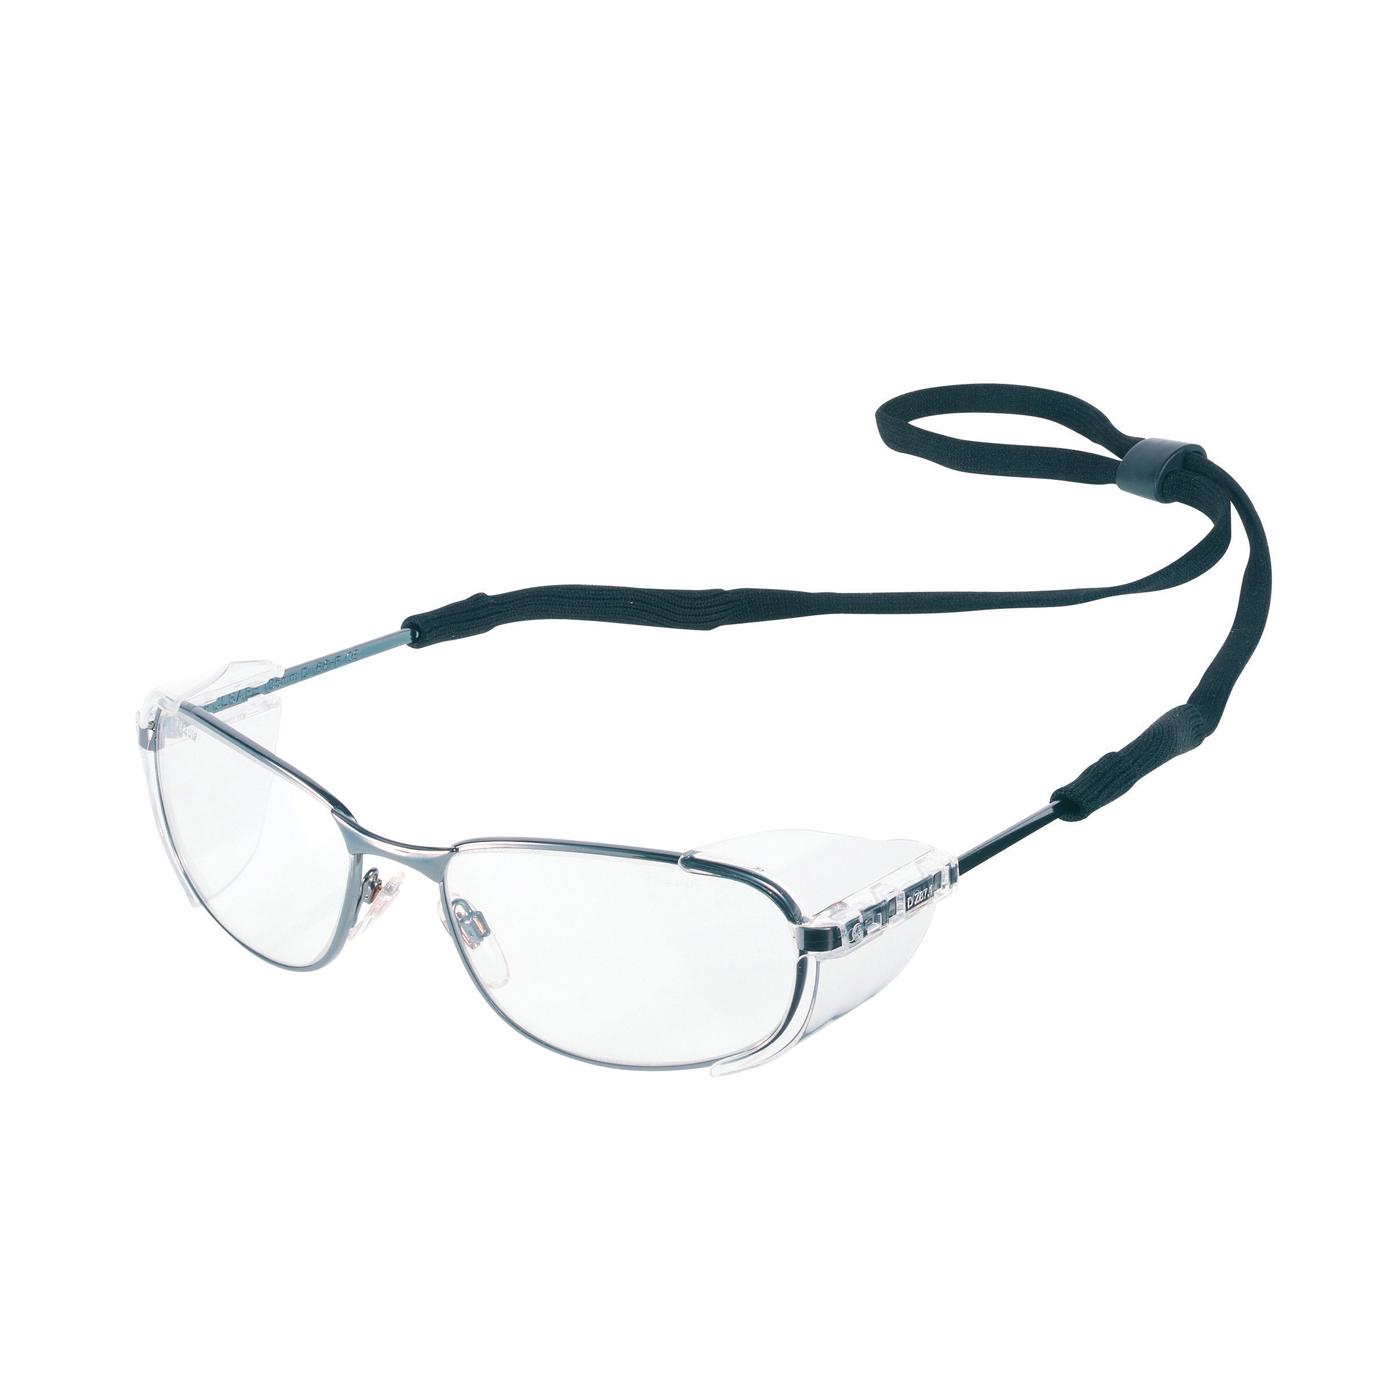 Okulary ochronne Stellar 1005564 Honeywell